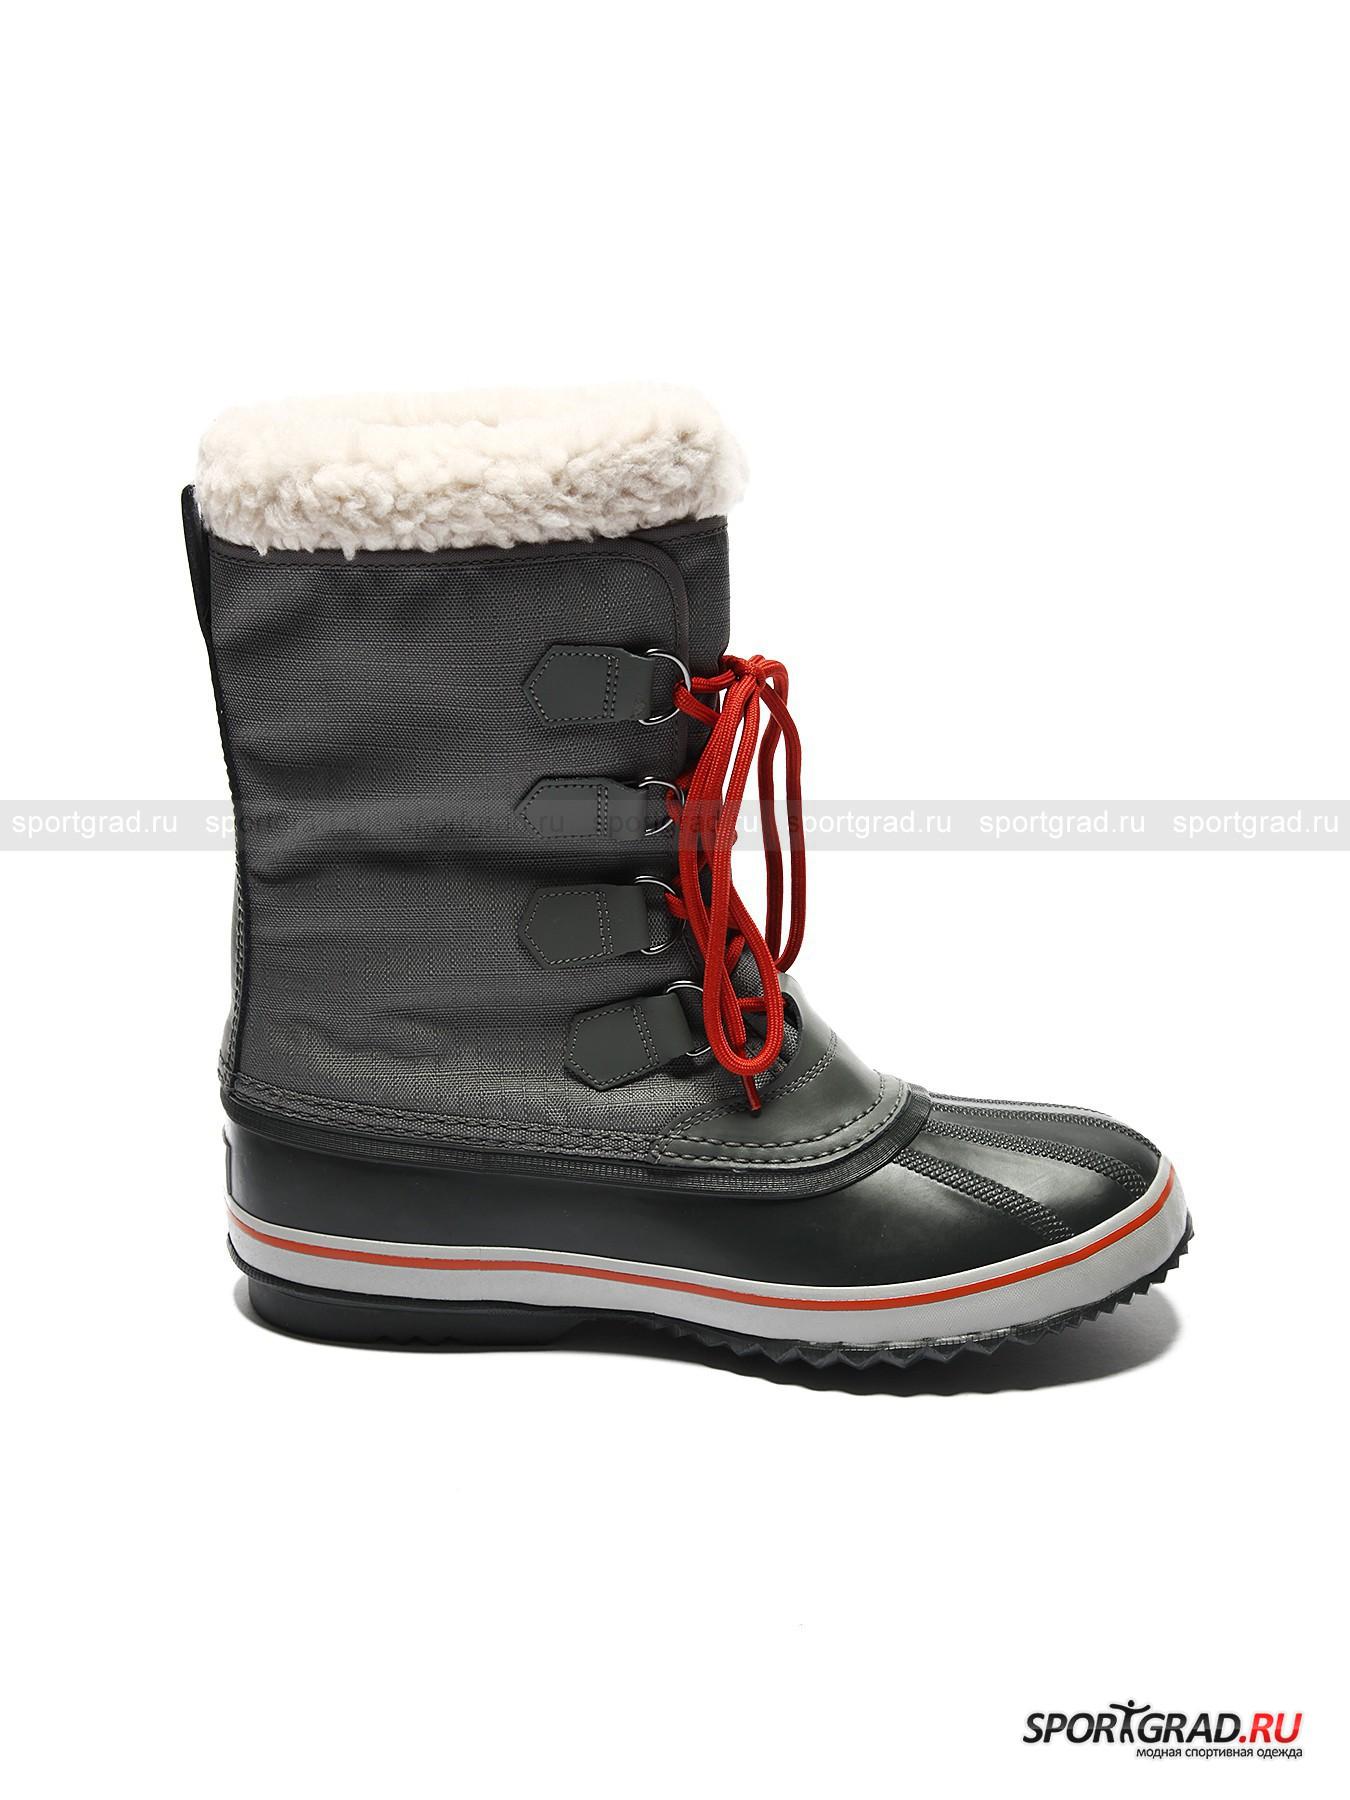 Ботинки мужские для холодов Pac Nylon SOREL от Спортград